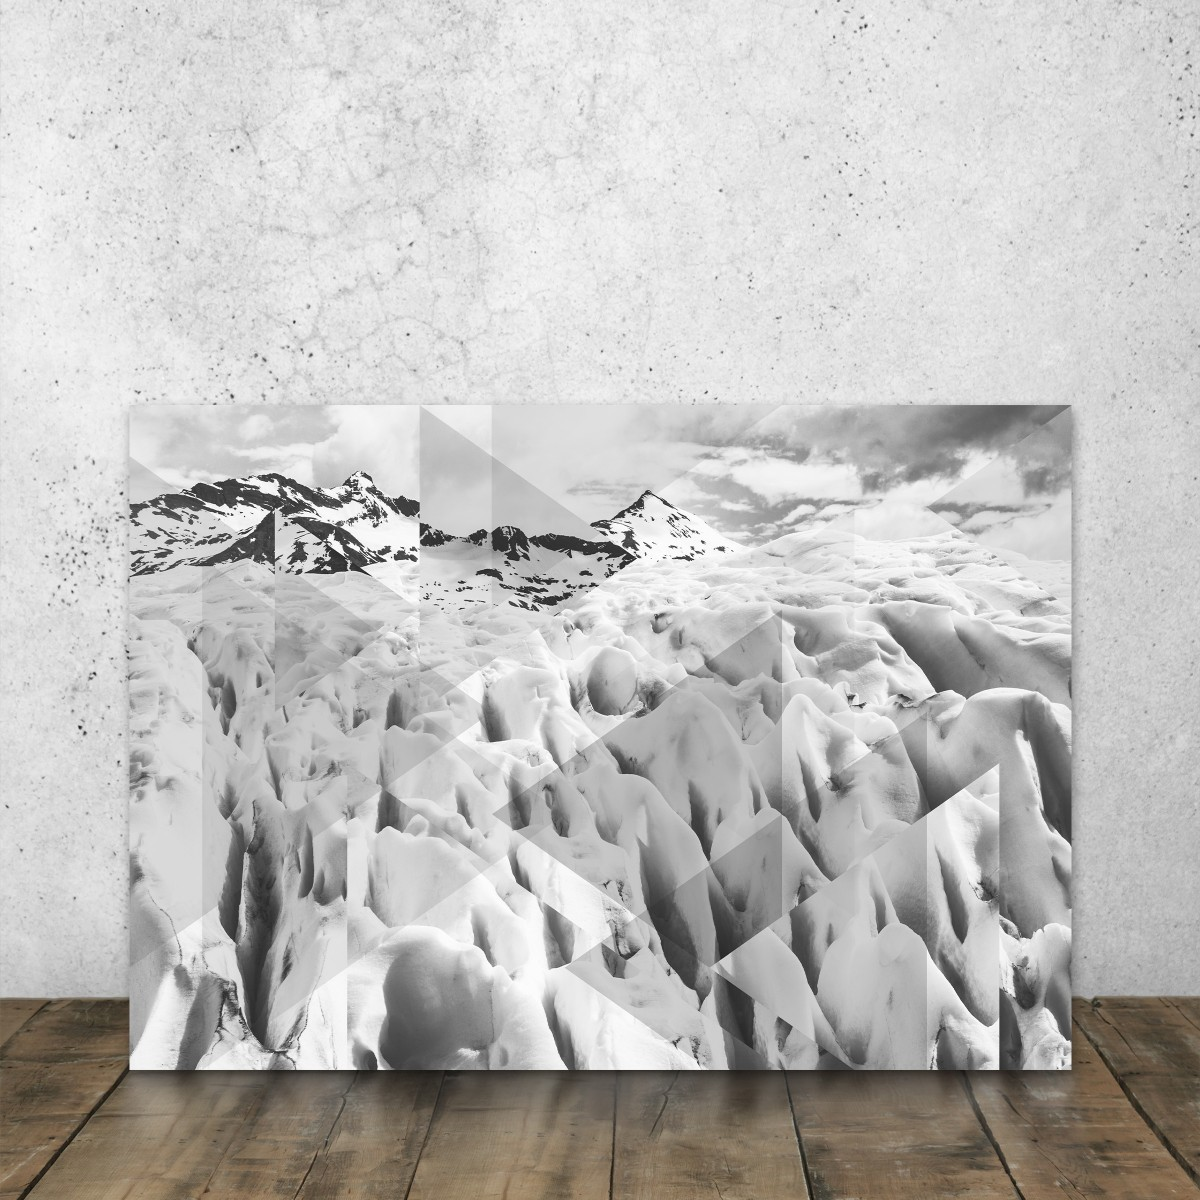 JOE MANIA / Modern Artprint Poster / Landscapes Scattered 2 (Perito Moreno B&W) DIN A4 - A0